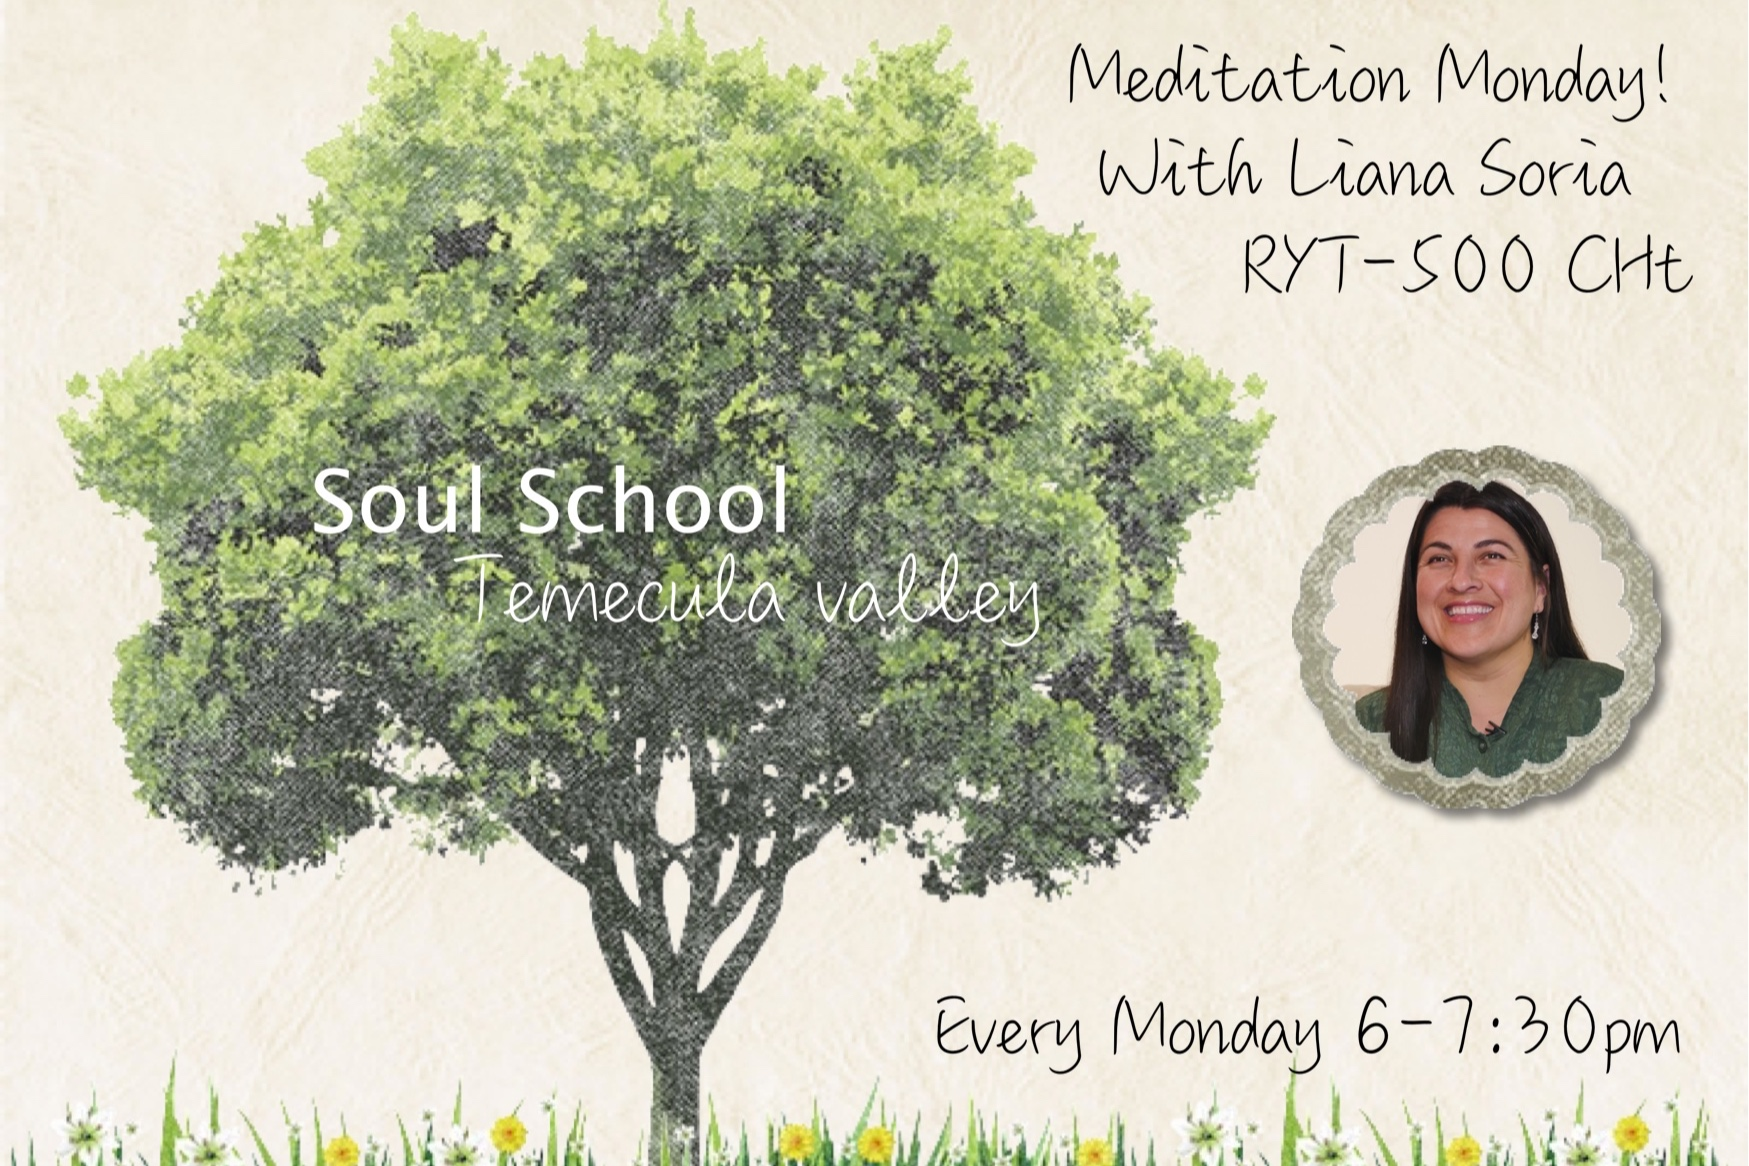 - Meditation Mondays